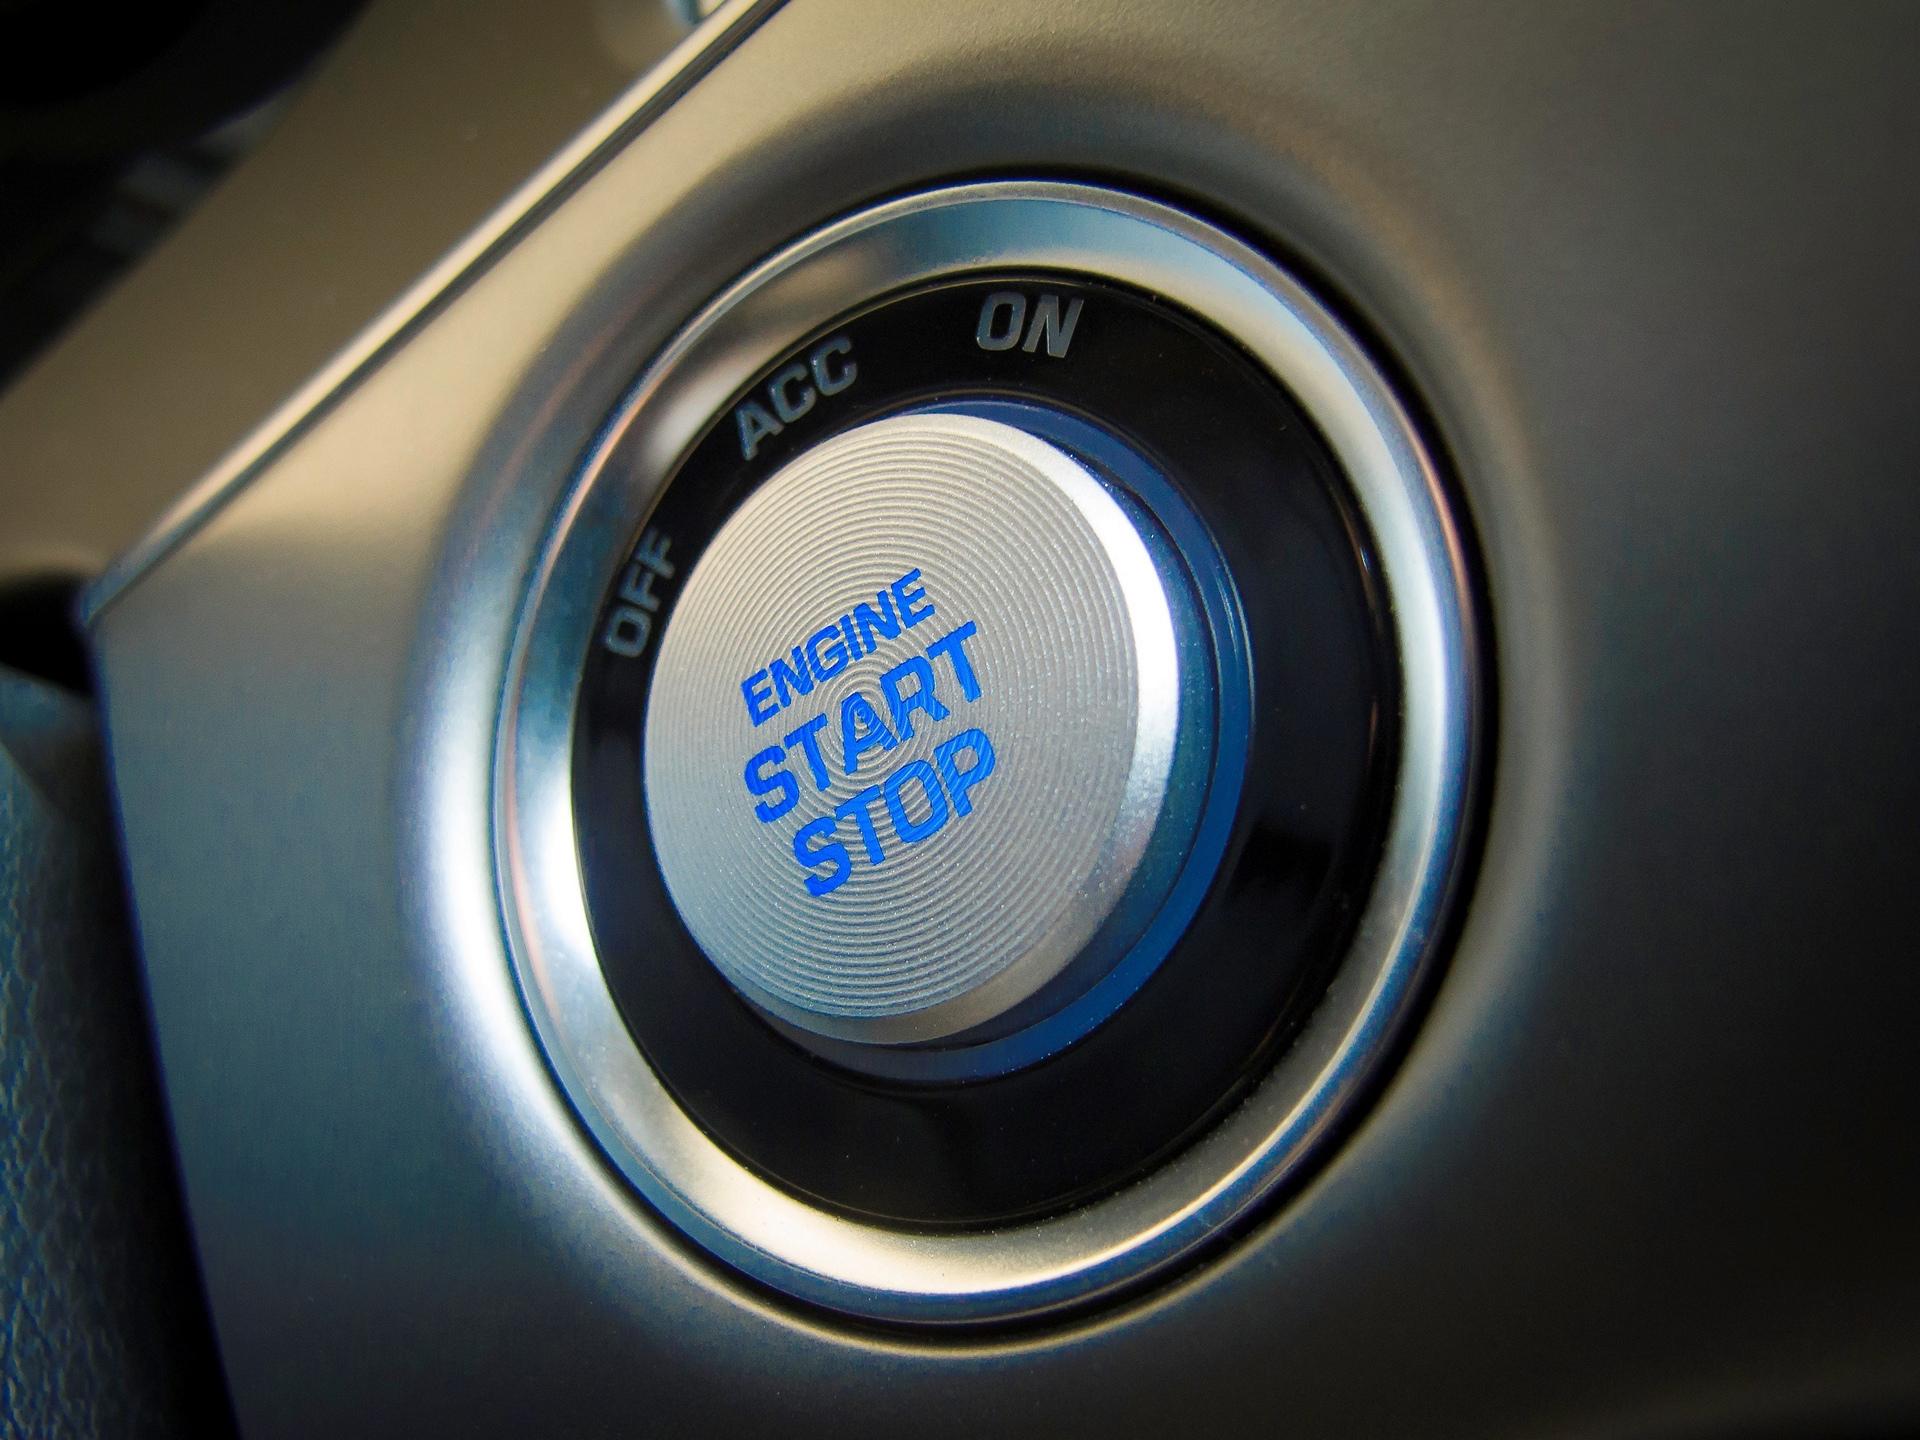 2017 Hyundai Sonata © Hyundai Motor Company